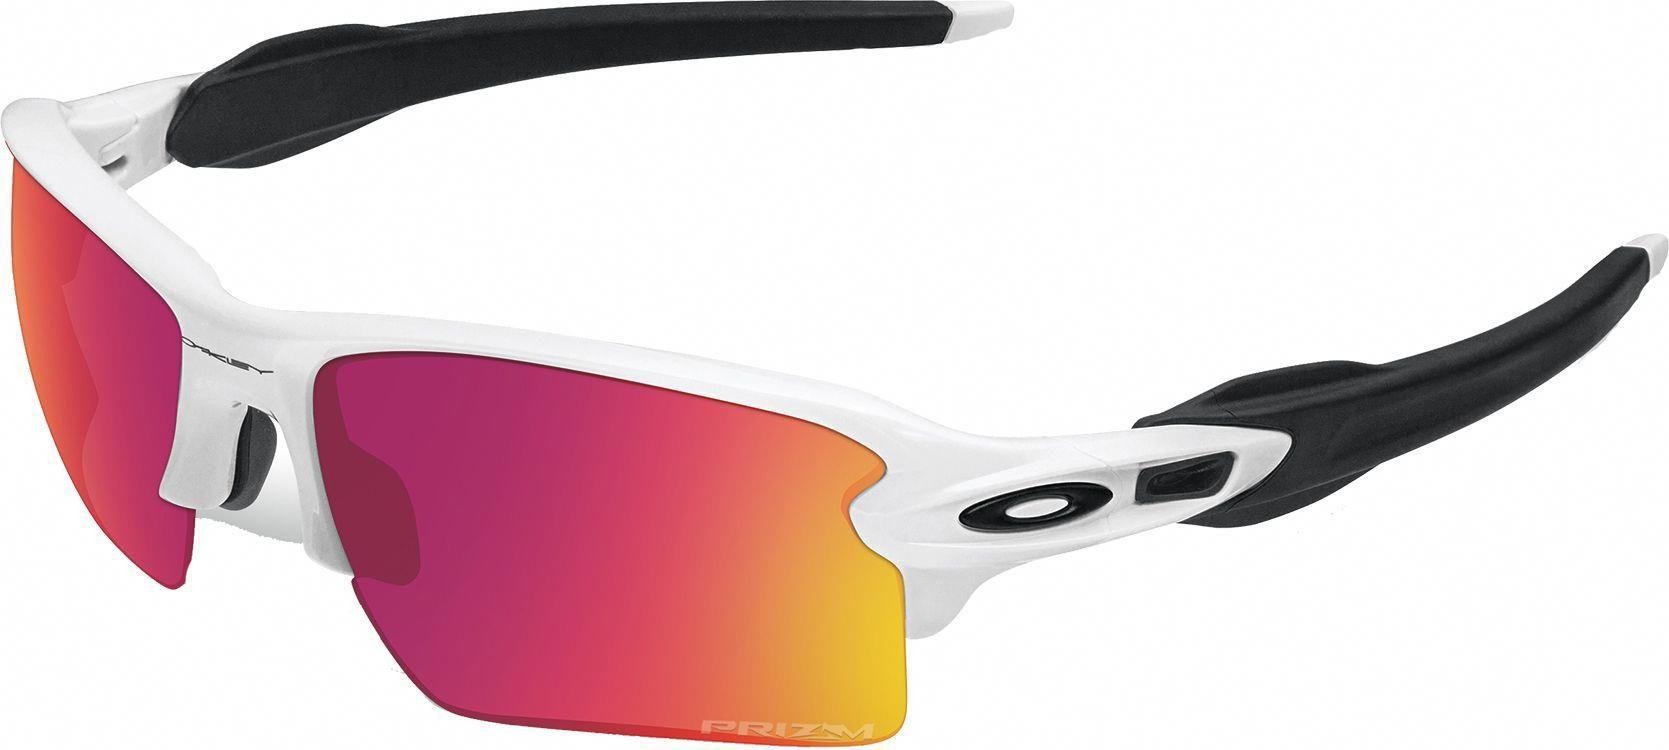 Oakley Men's Flak 2.0 XL Baseball Sunglasses